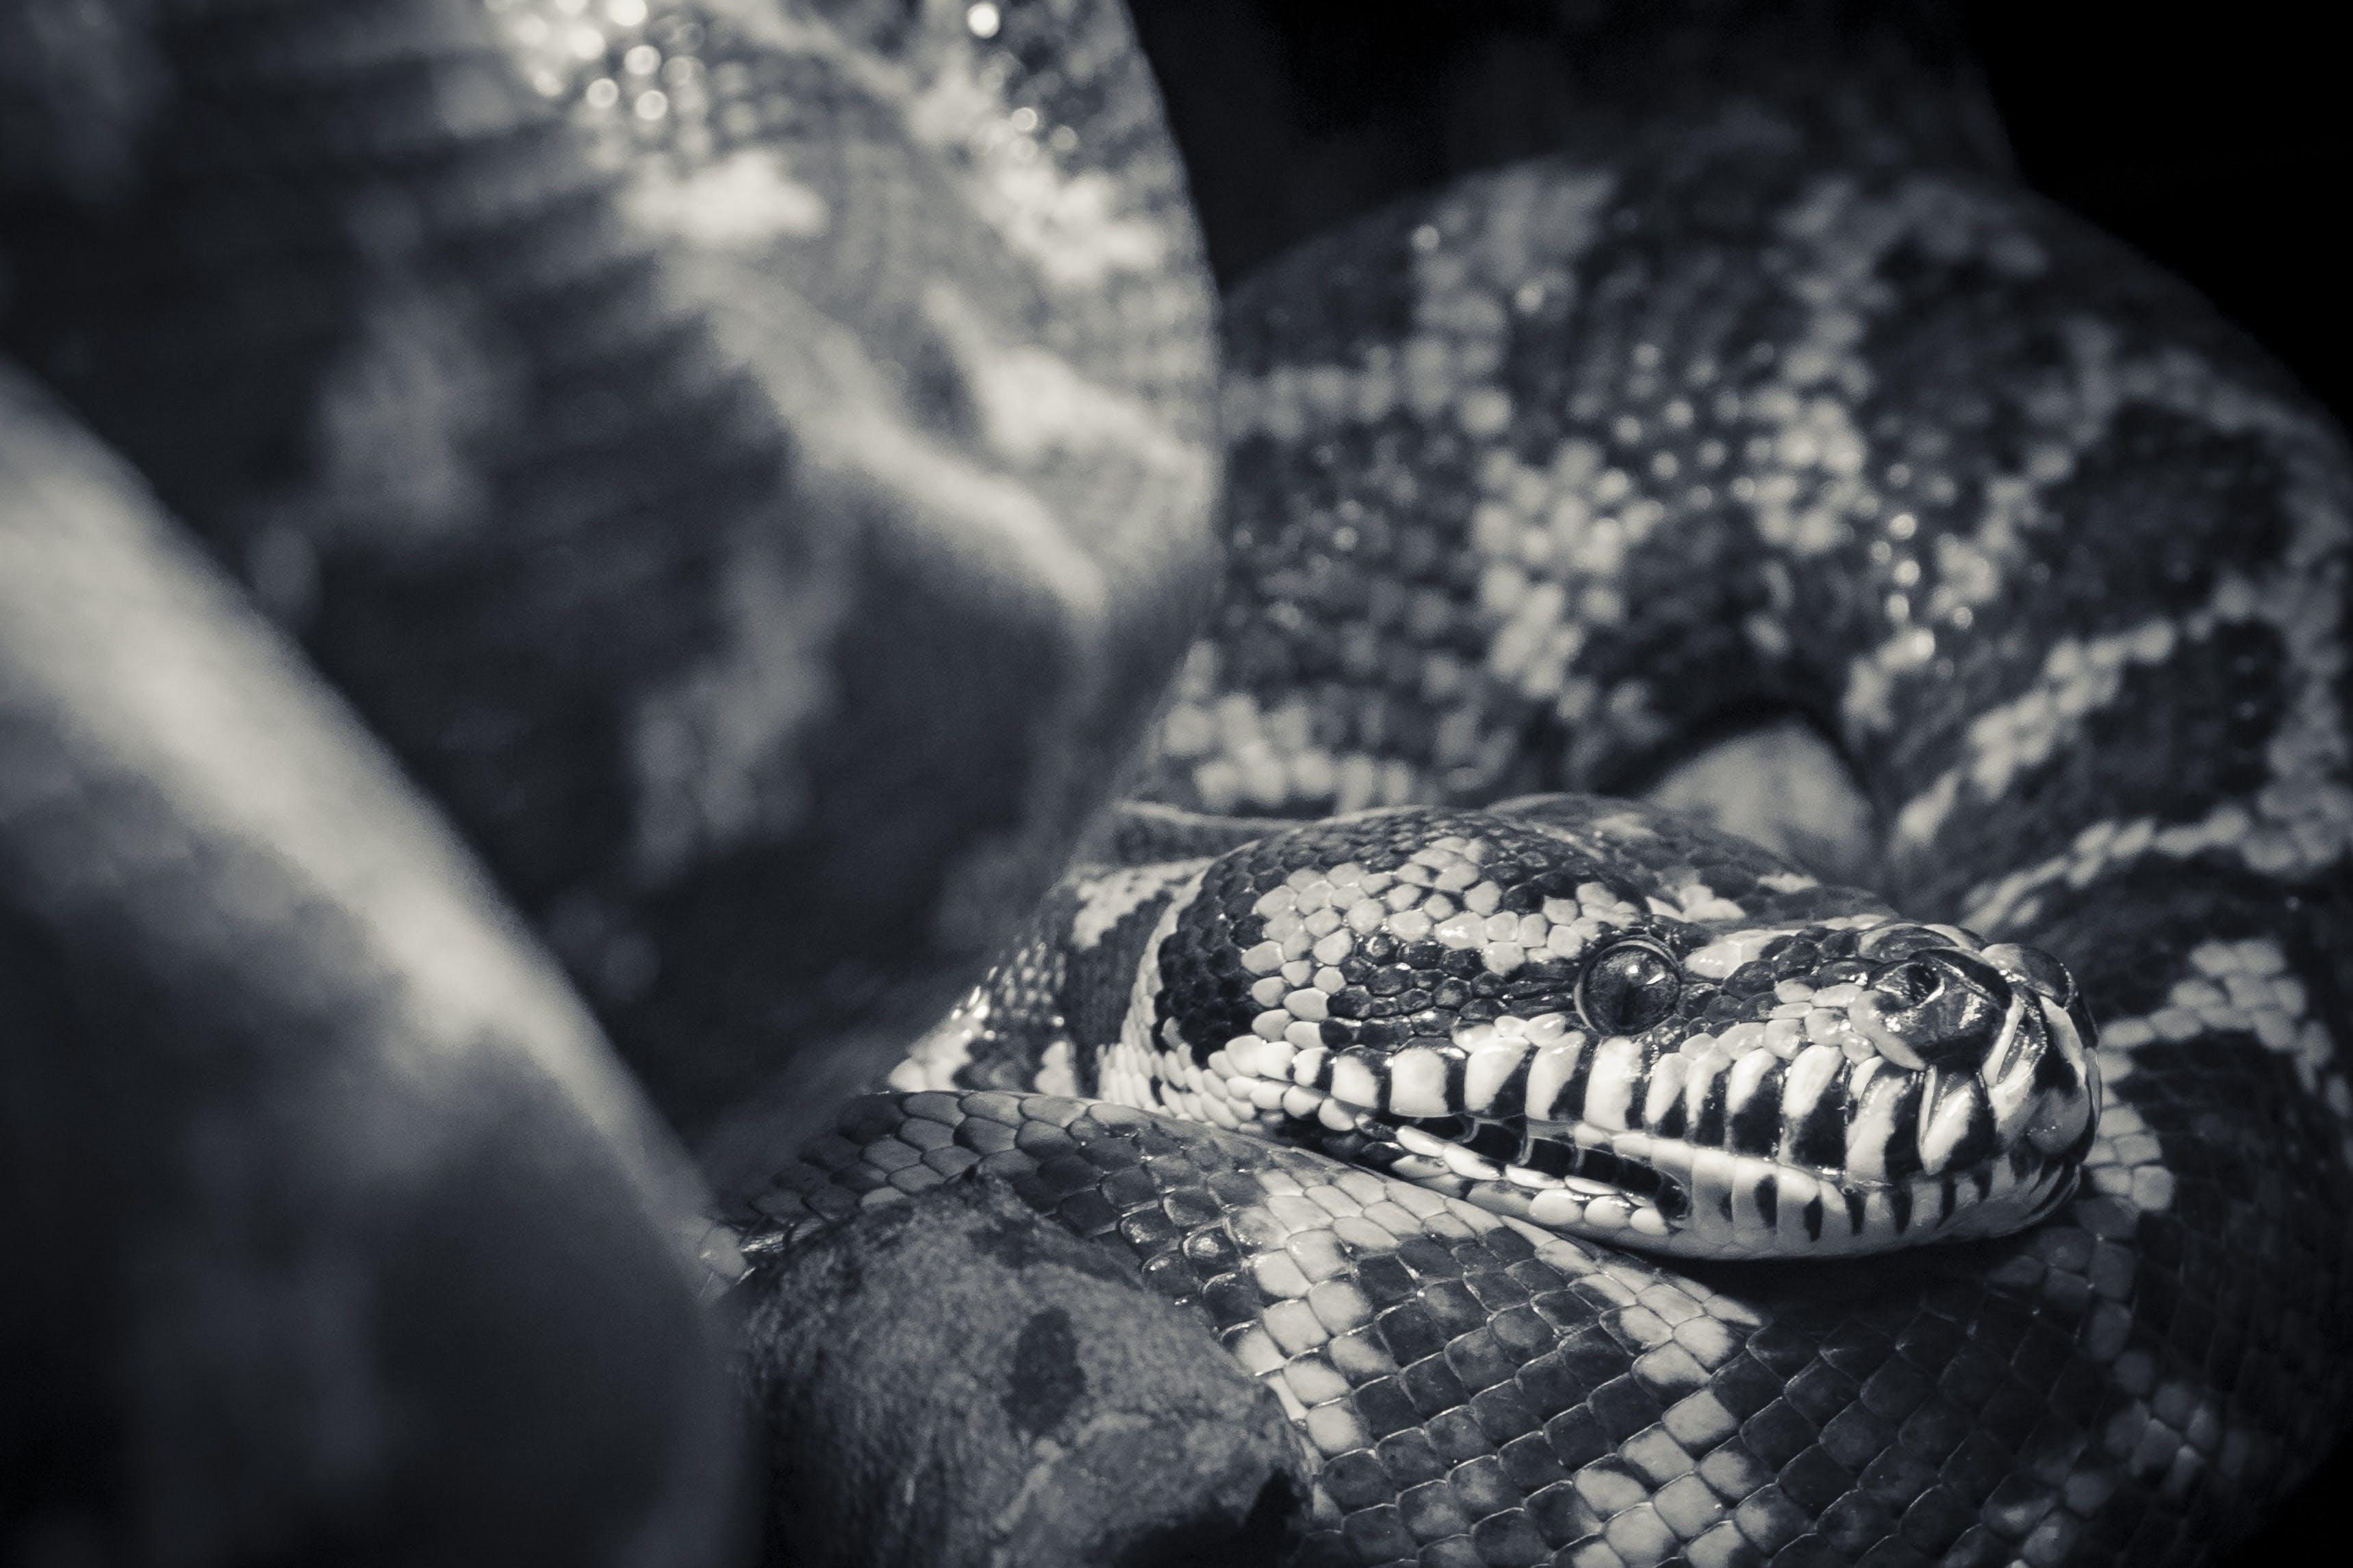 Free stock photo of animal, black and white, close up, eyes